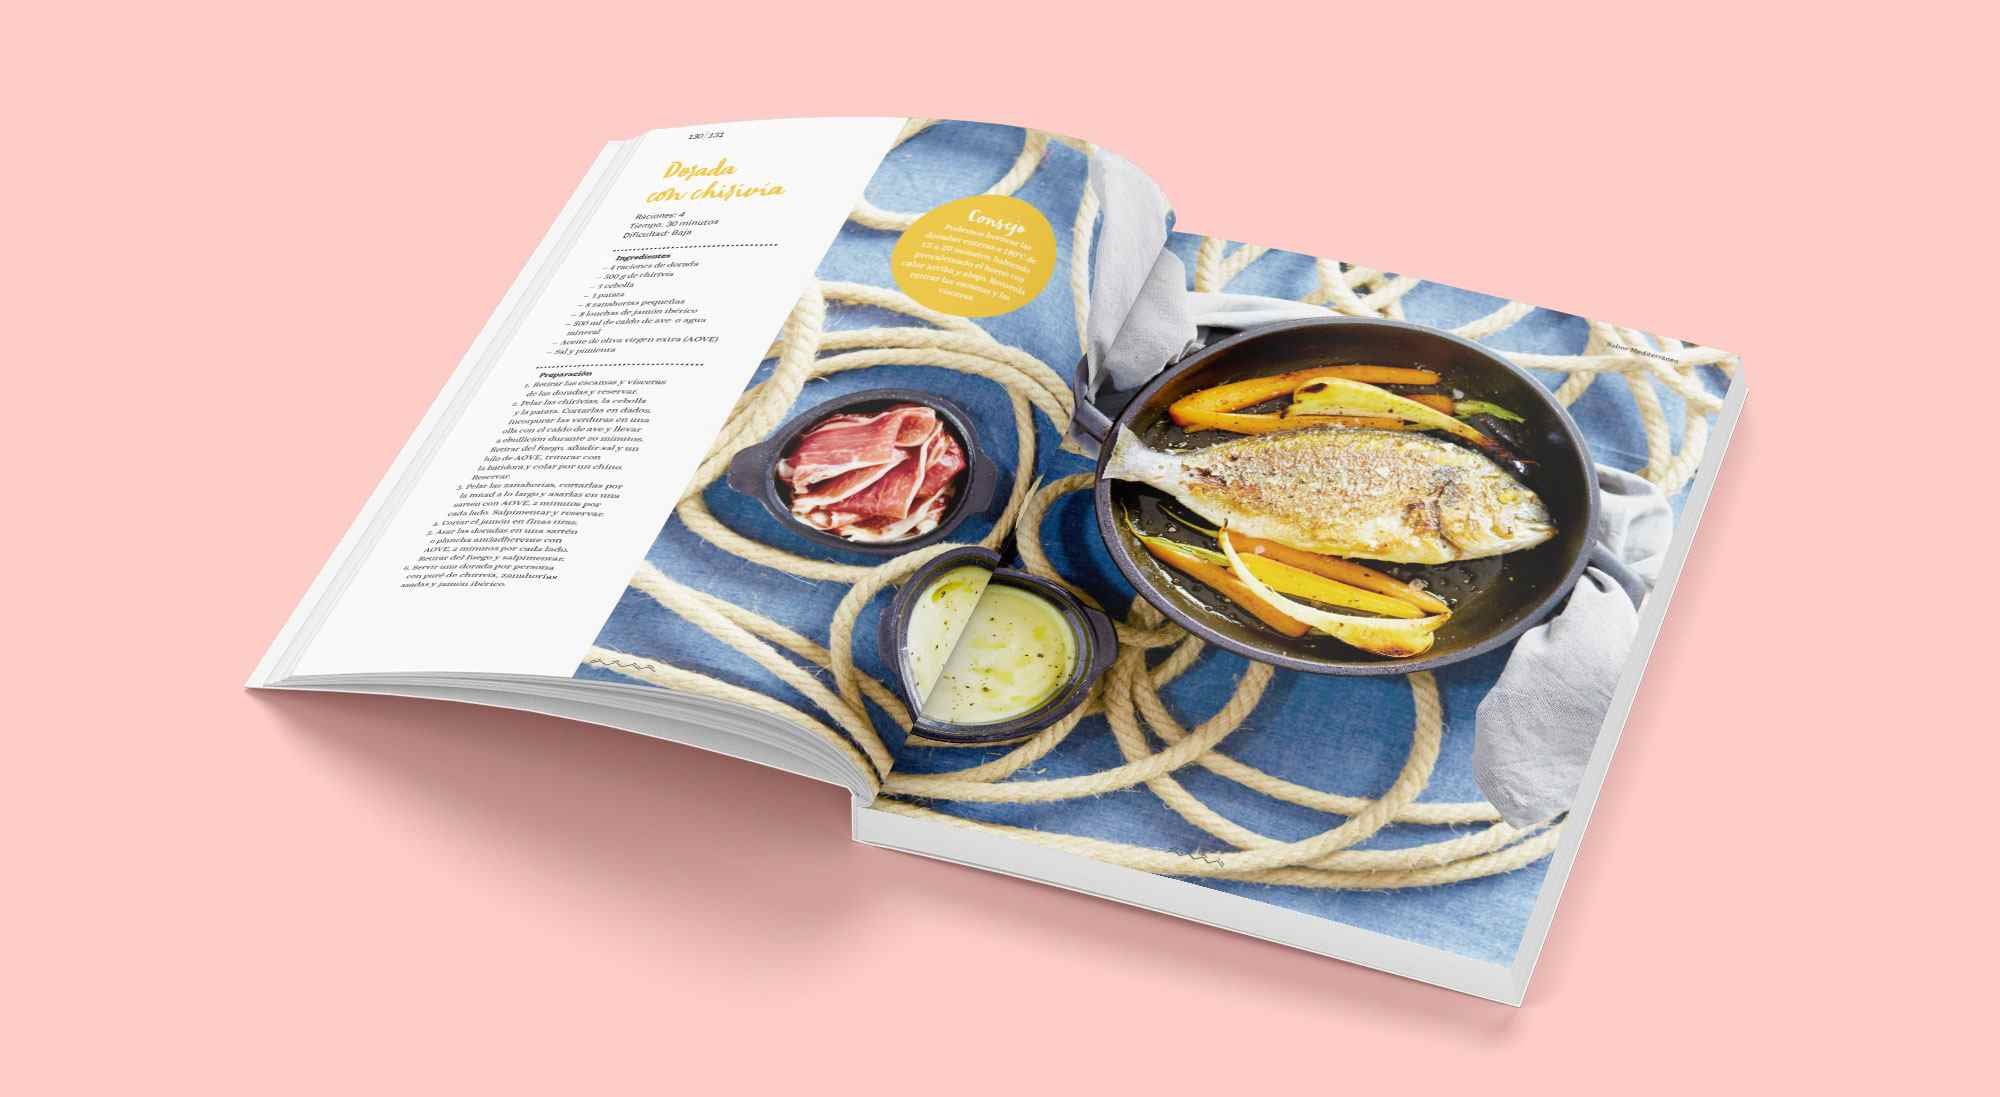 libro dieta mediterranea